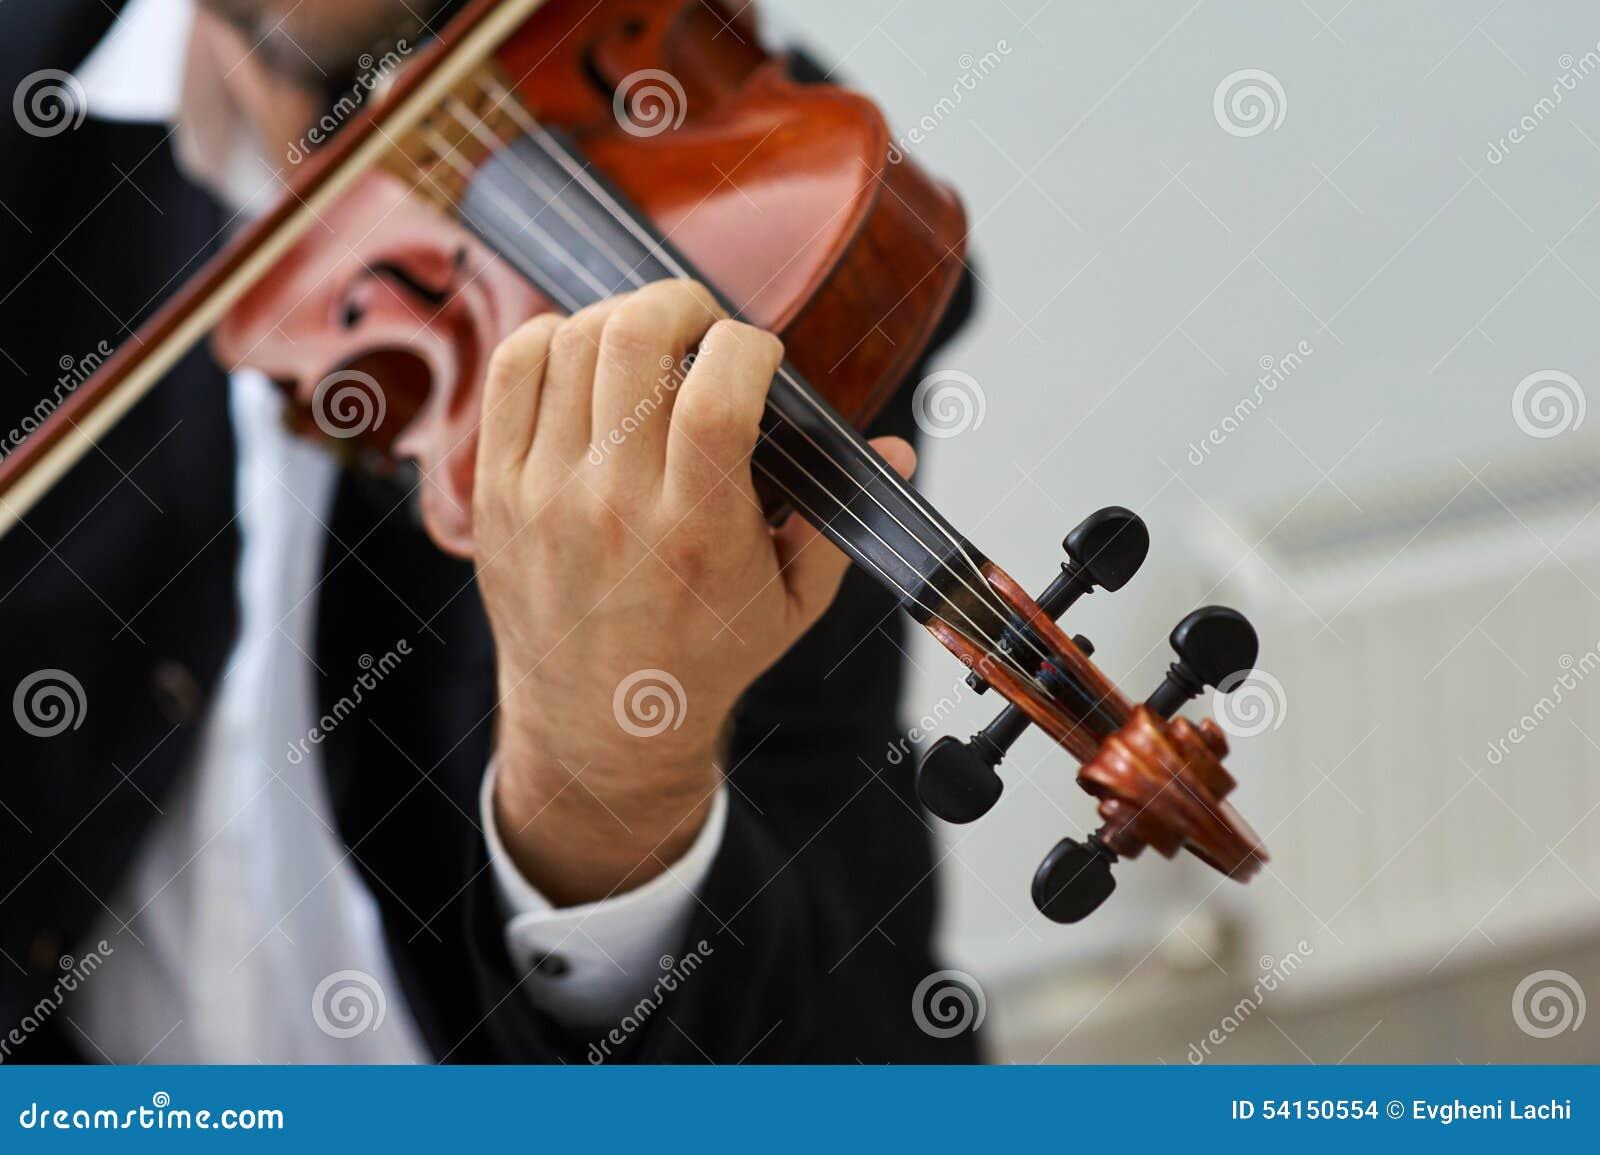 Violinista Playing Classical Violin dos homens